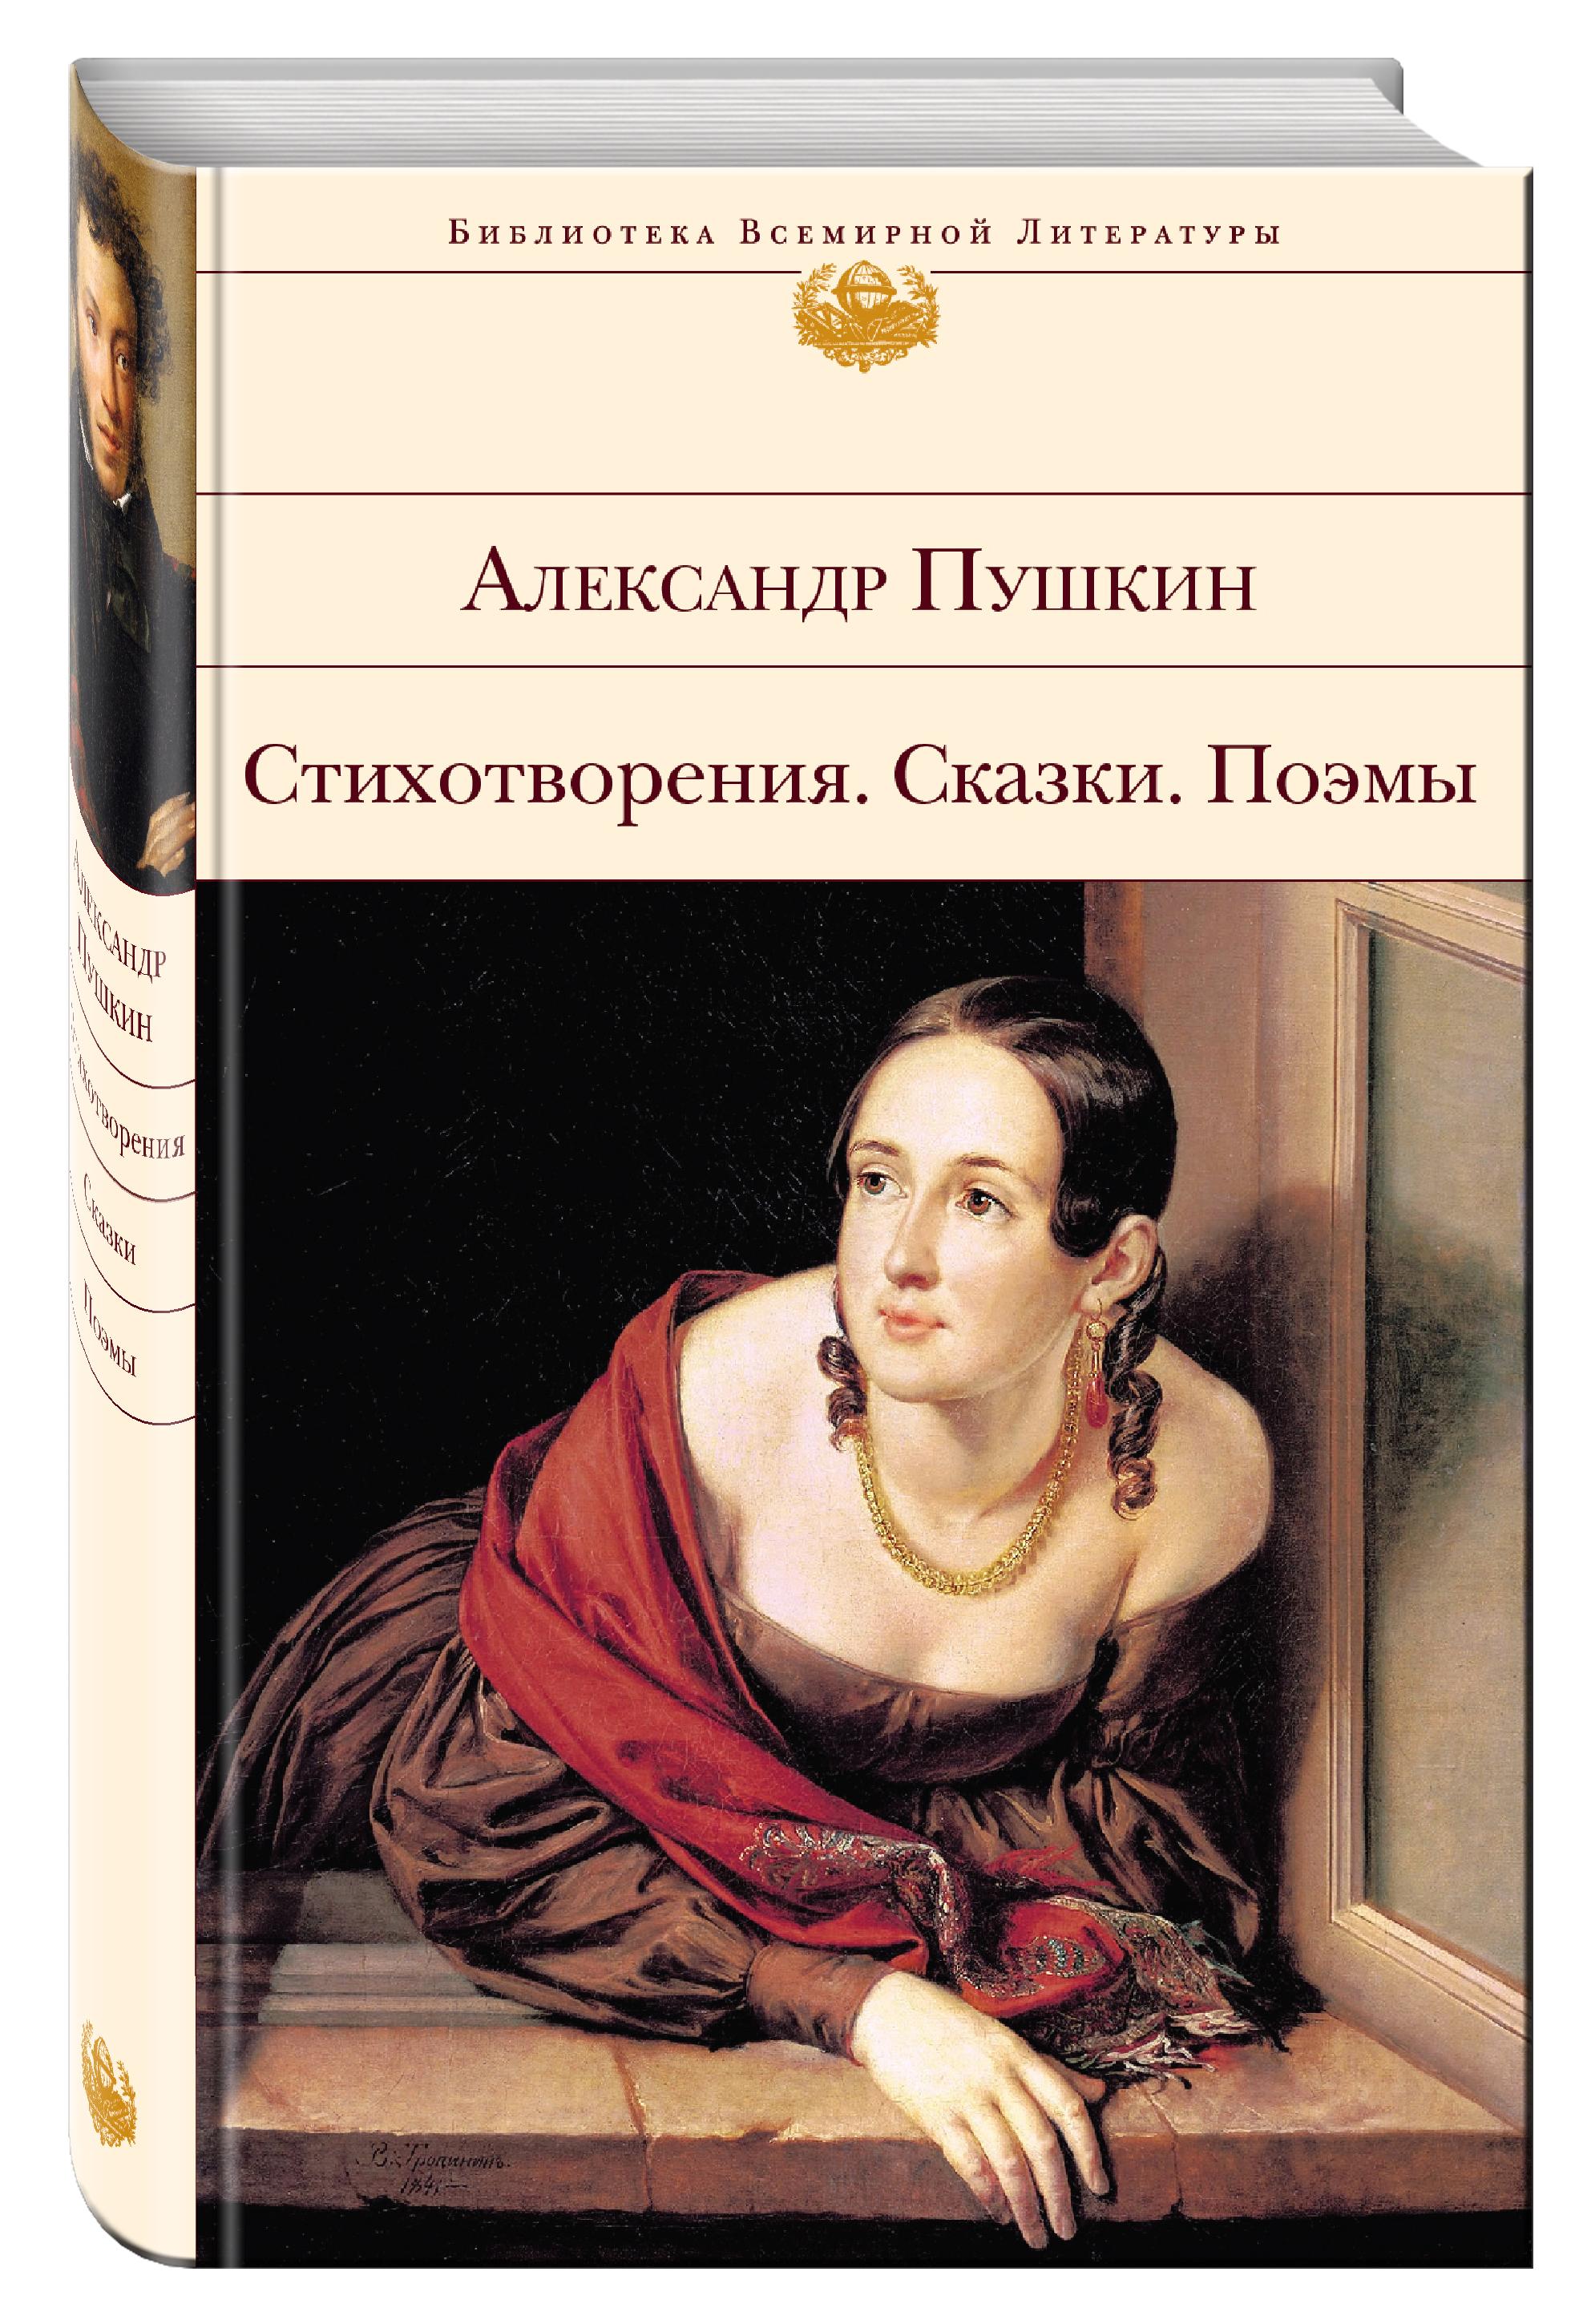 все цены на Александр Пушкин Стихотворения. Сказки. Поэмы онлайн